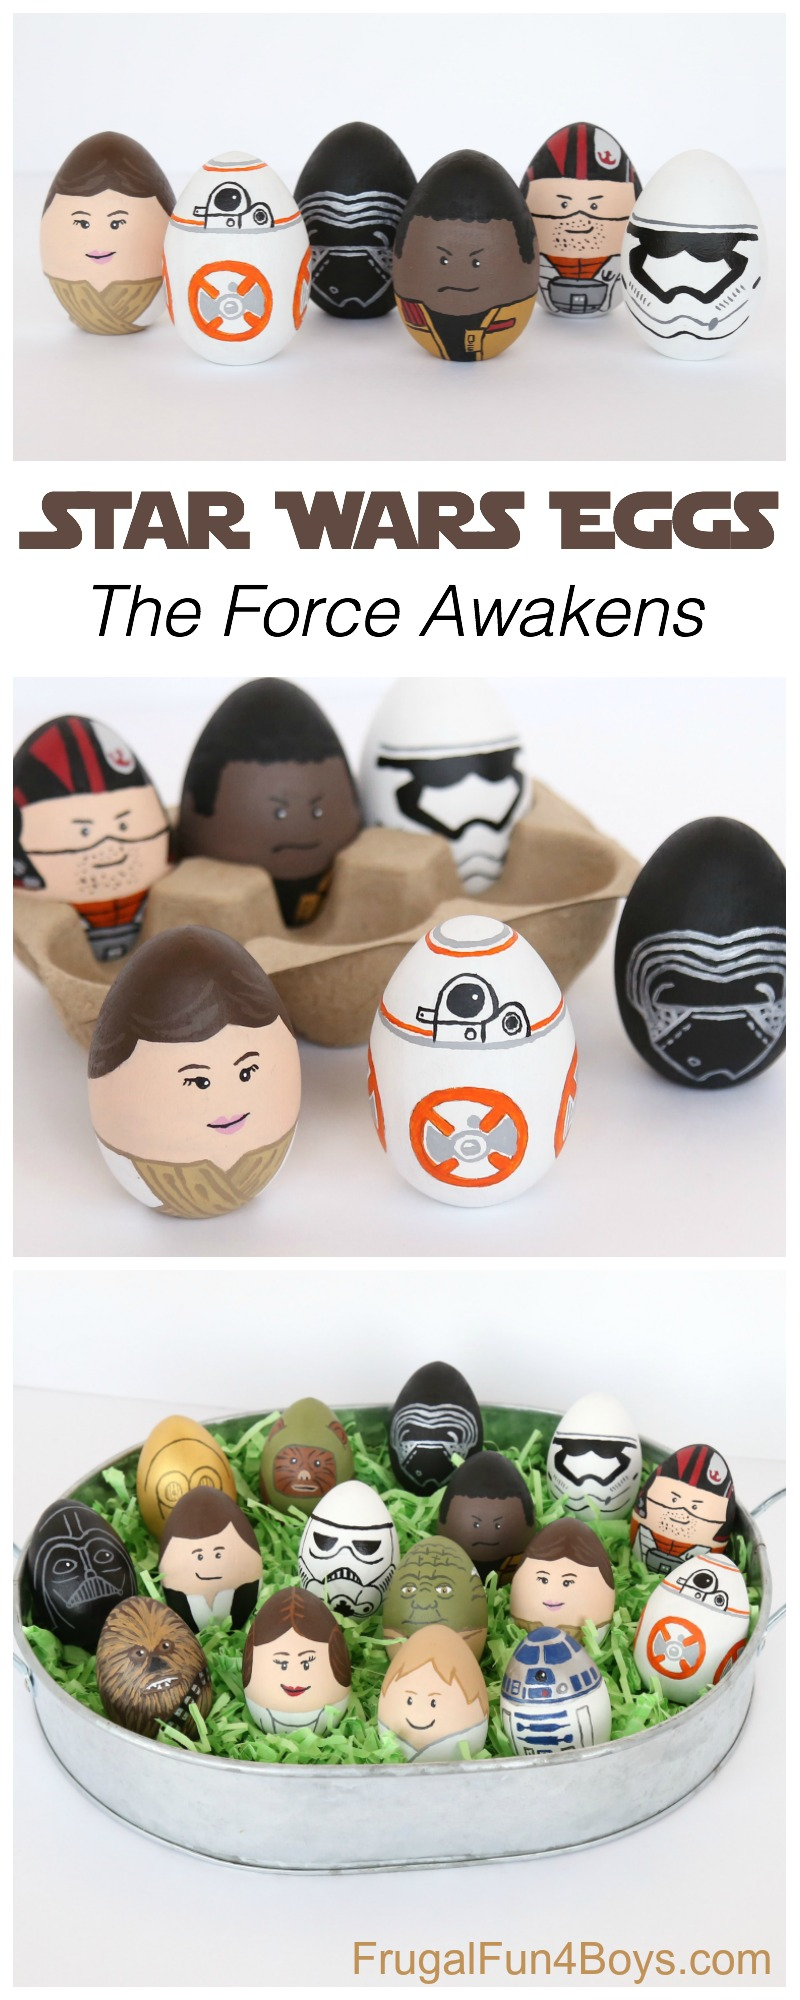 Star Wars Painted Eggs - The Force Awakens! Rey, BB8, Finn, Kylo Ren, Poe, Stormtrooper